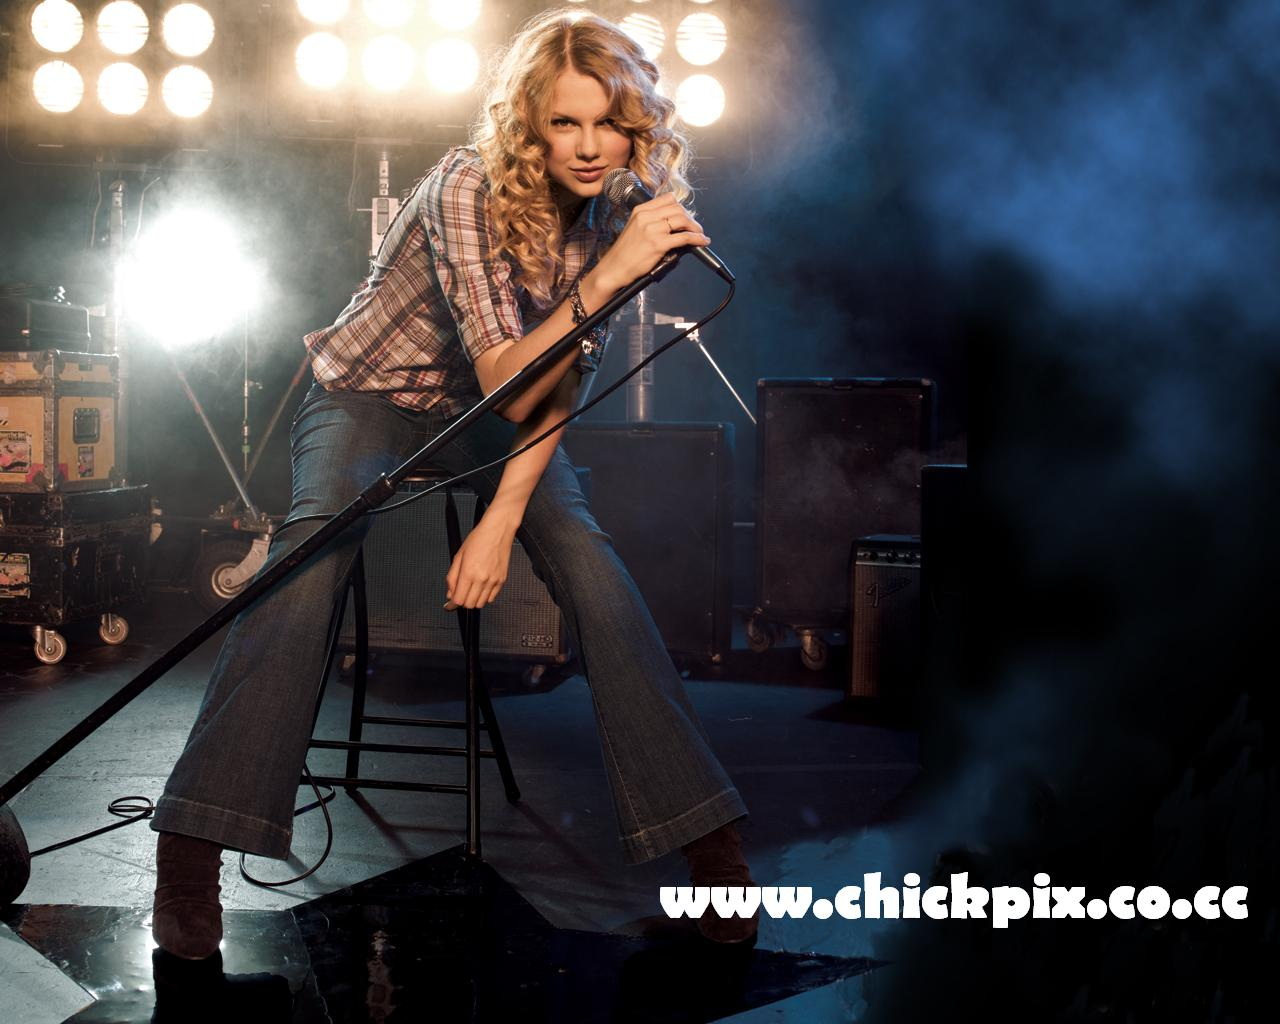 http://3.bp.blogspot.com/-t8yyoaZfIZk/T6p-g-hSk8I/AAAAAAAAI0E/V9LzqjqBaEA/s1600/Taylor+Swift+Sext+www.chickpix.co.cc+(2).jpg